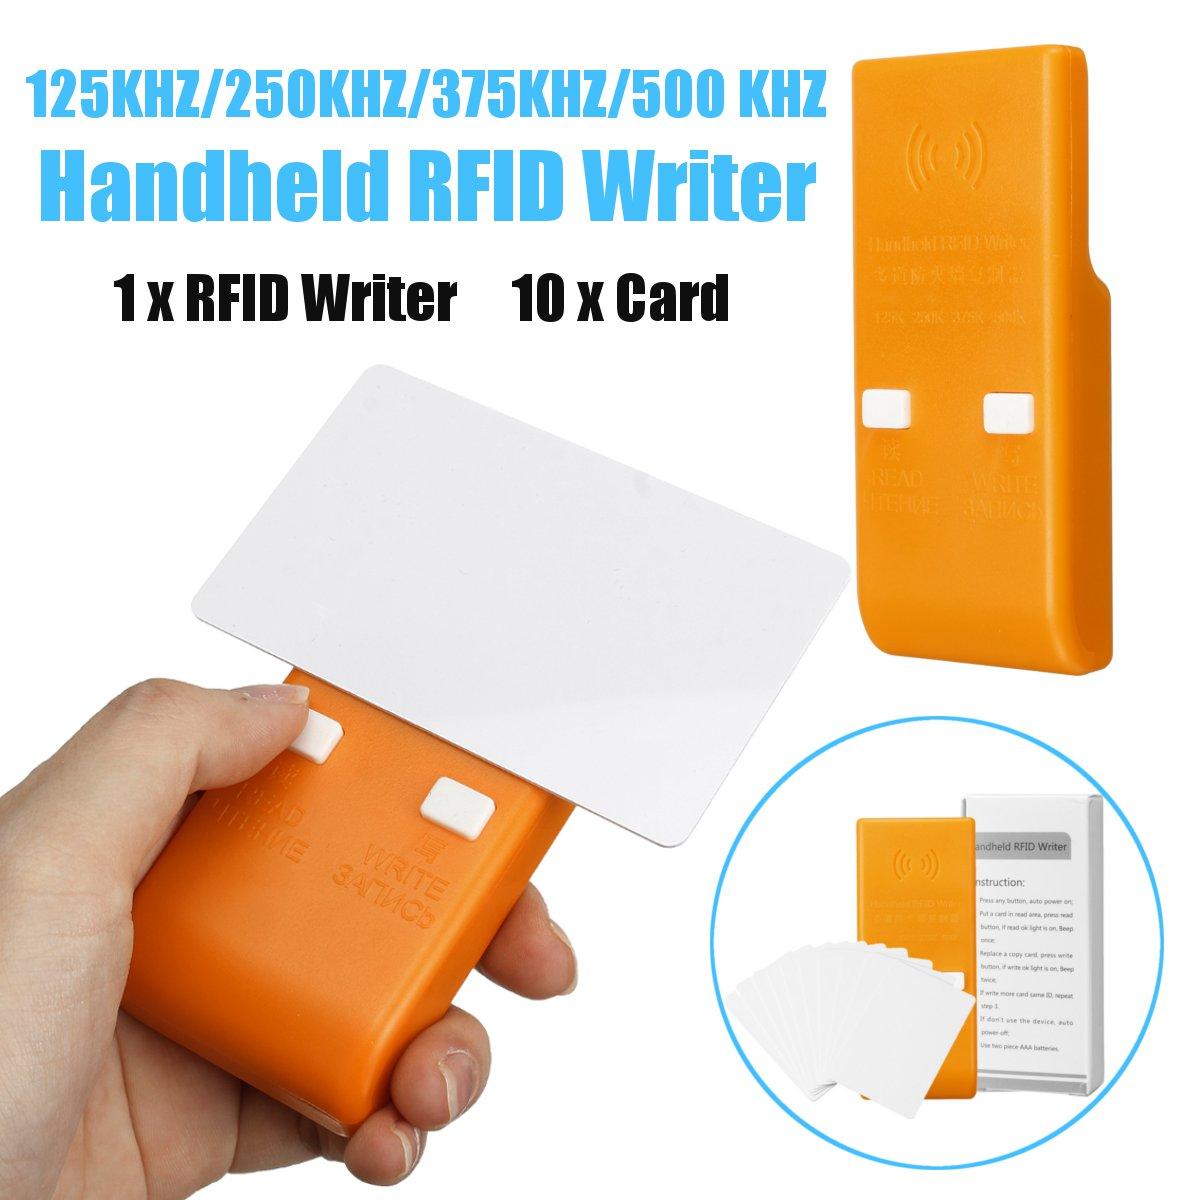 Portable RFID Access ID Card Reader Handheld RFID Writer ID Key Card Copier Reader Duplicator 125KHZ/250 KHZ/375 KHZ/500KHZ